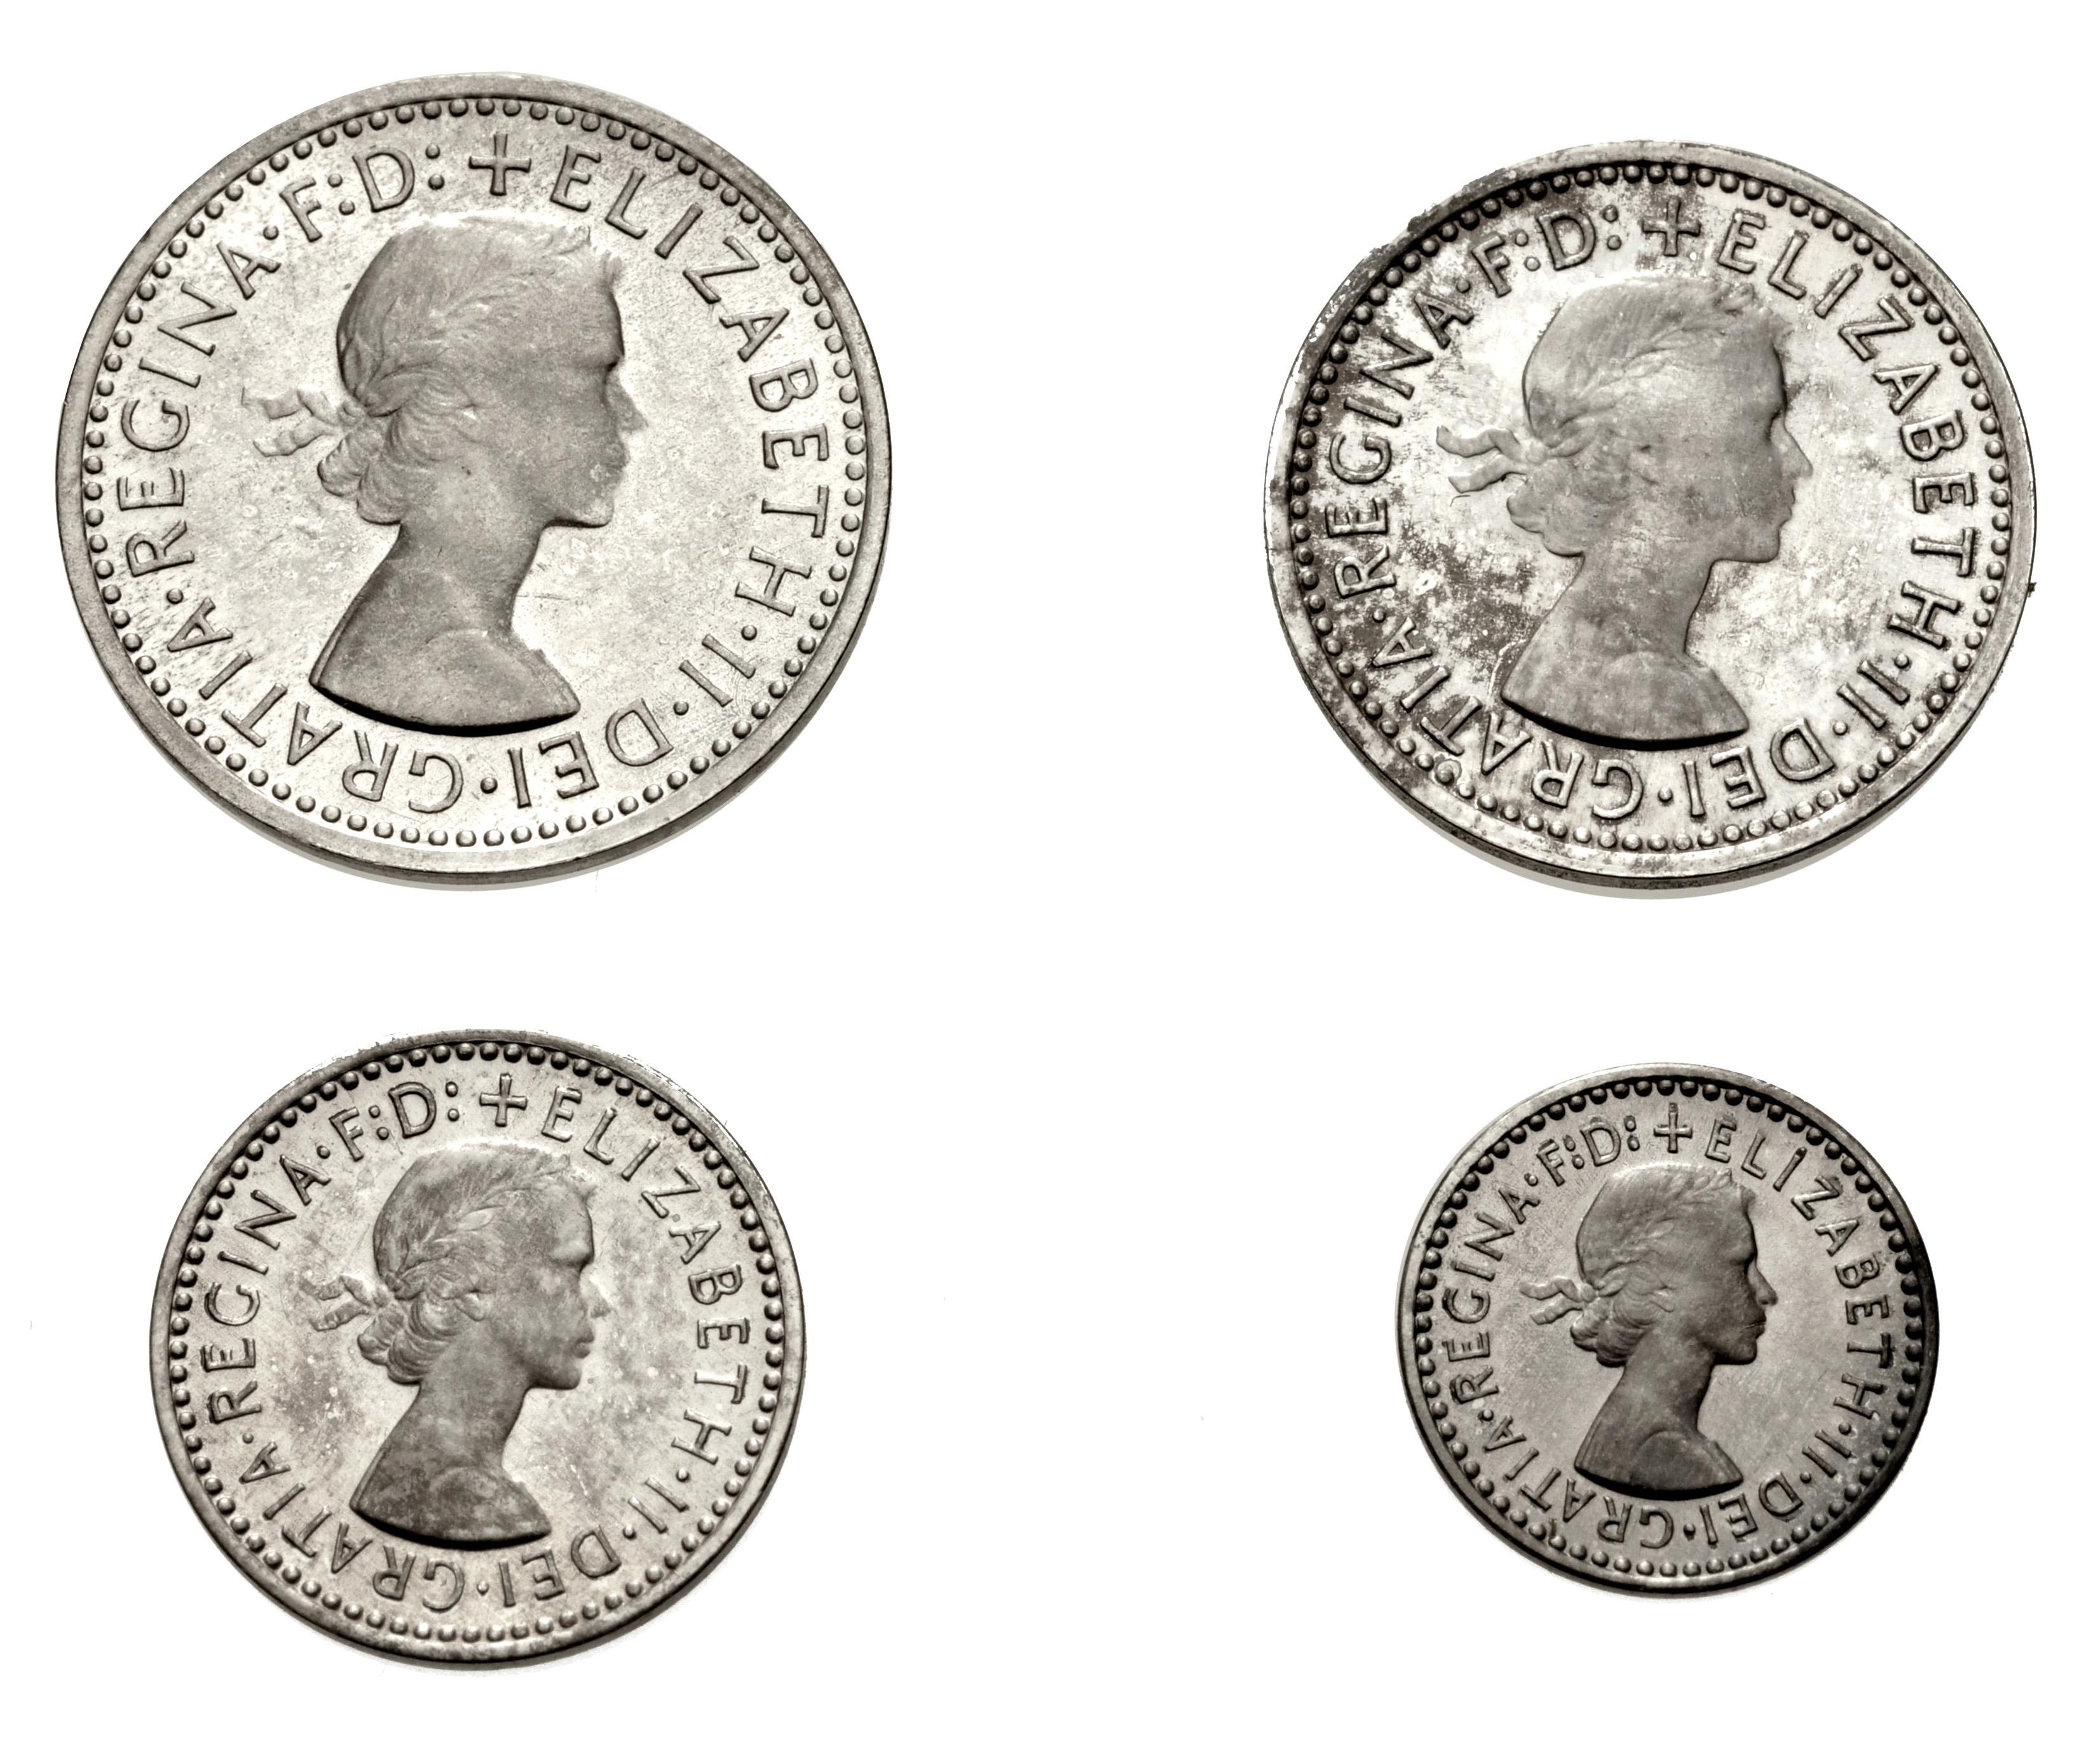 Fiji 1965 1 Penny VF+ KM21